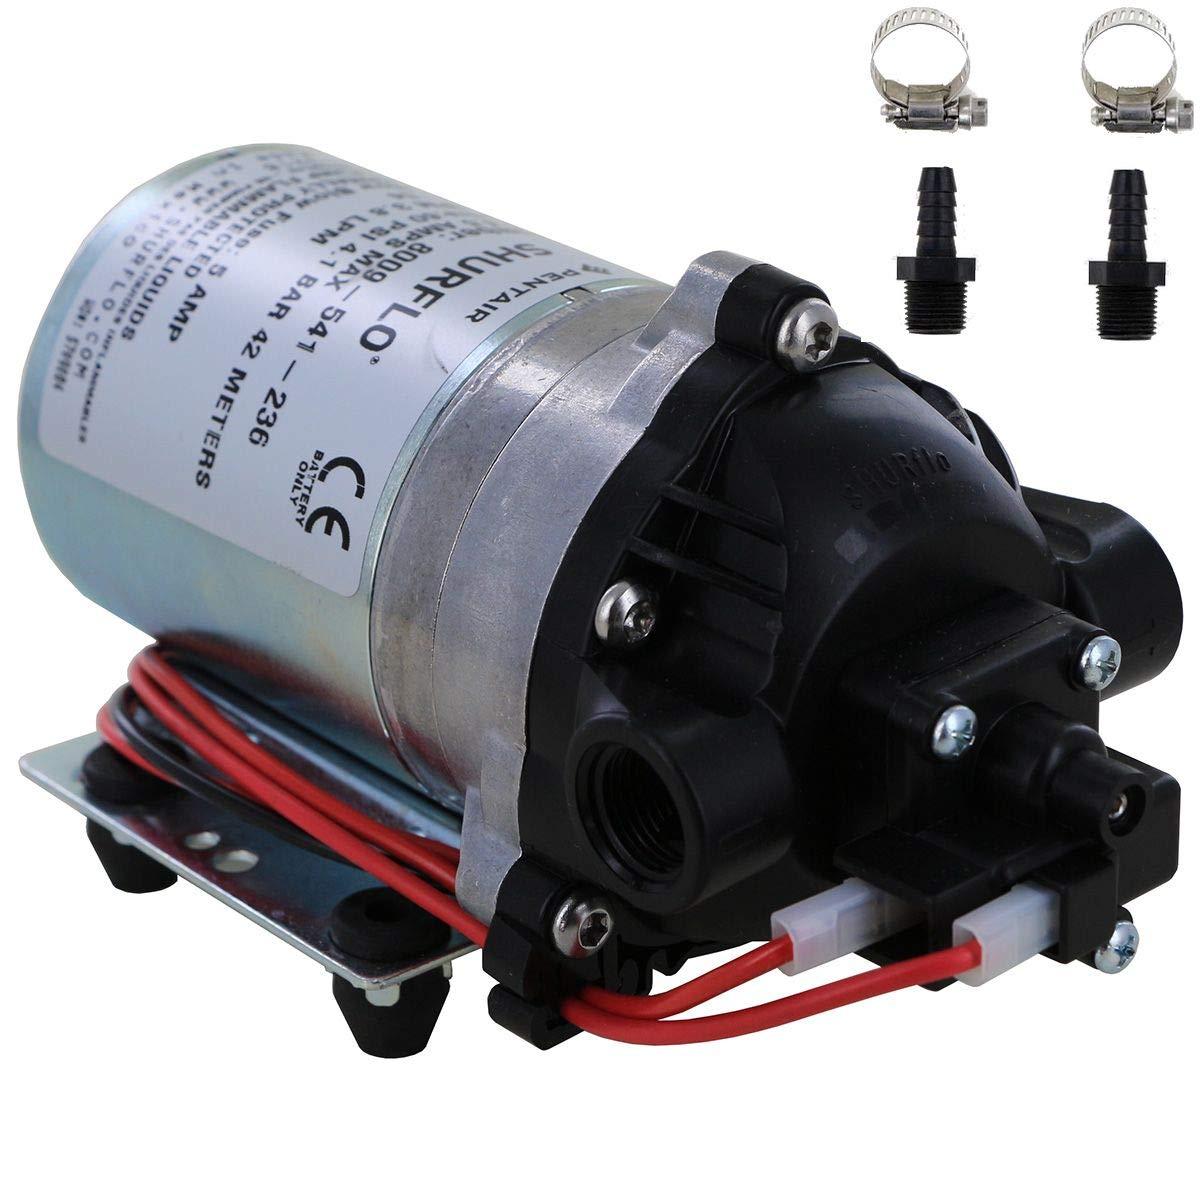 Shurflo 8000-541-236 Automatic-Demand 12V Diaphragm Pump with Male 3/8'' Hose Barb Kit (Bundle, 2 Items)